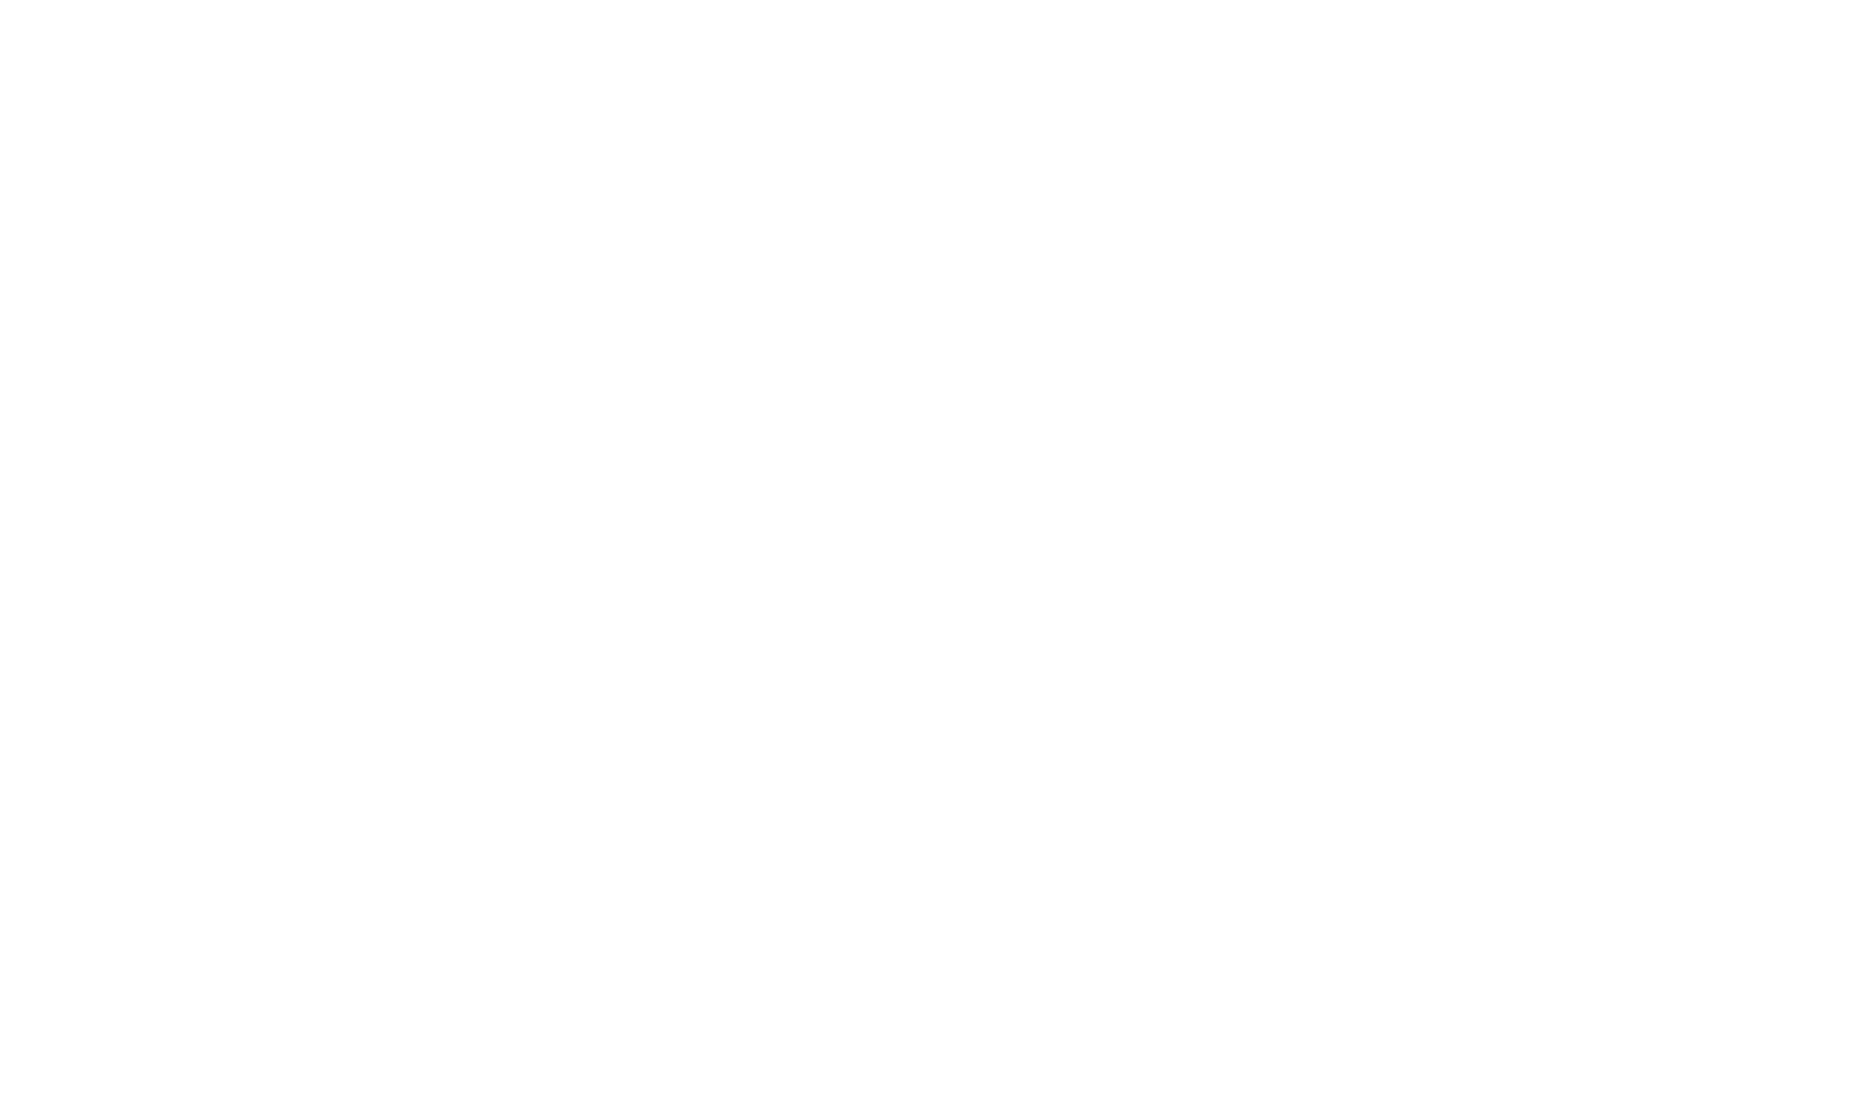 VVR | Esperanto Travel - Reisbureau Nieuwpoort